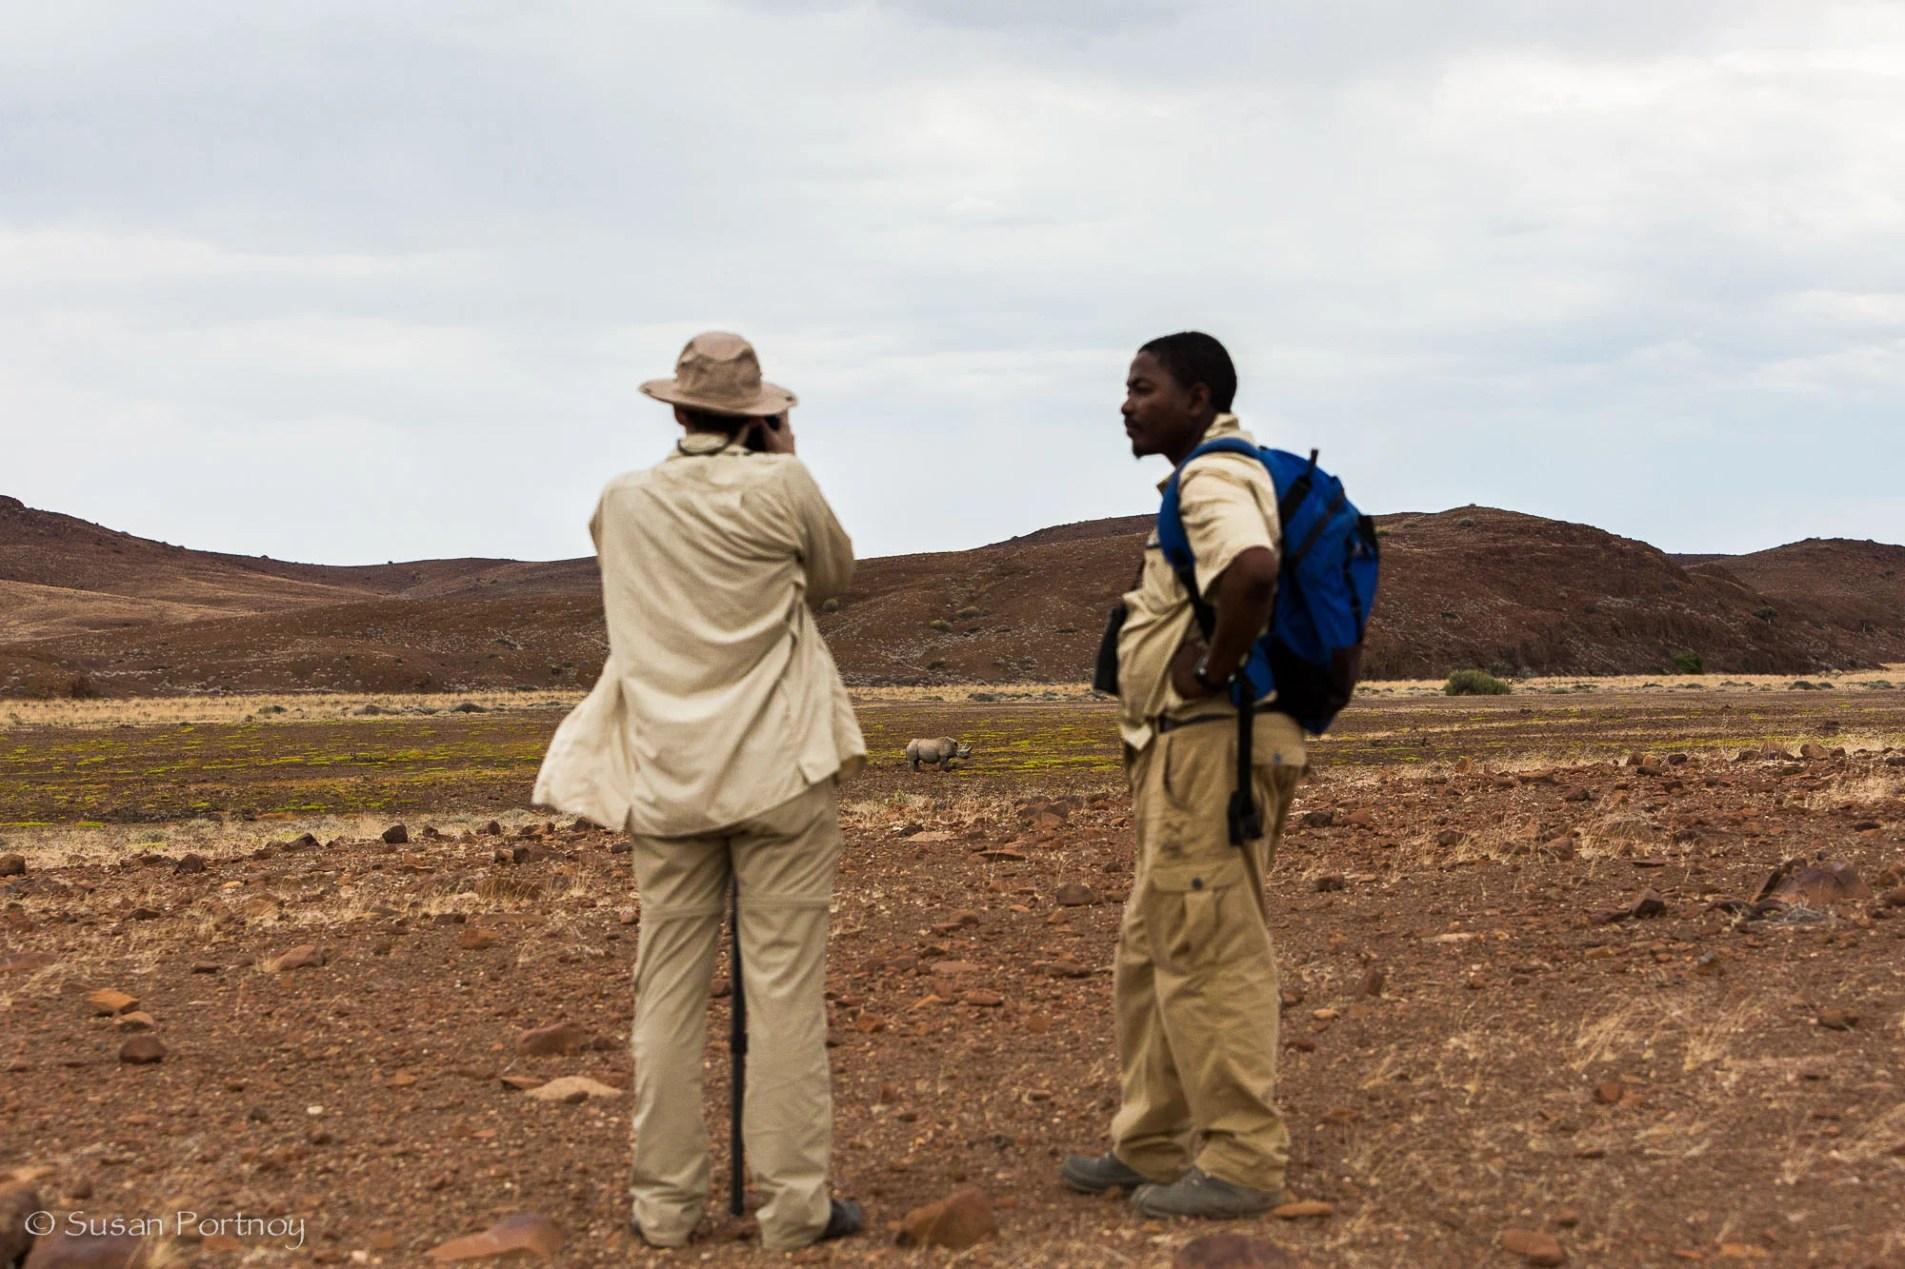 Susan Portnoy and Bons Roman photograph black rhino near Desert Rhino Camp, Namibia